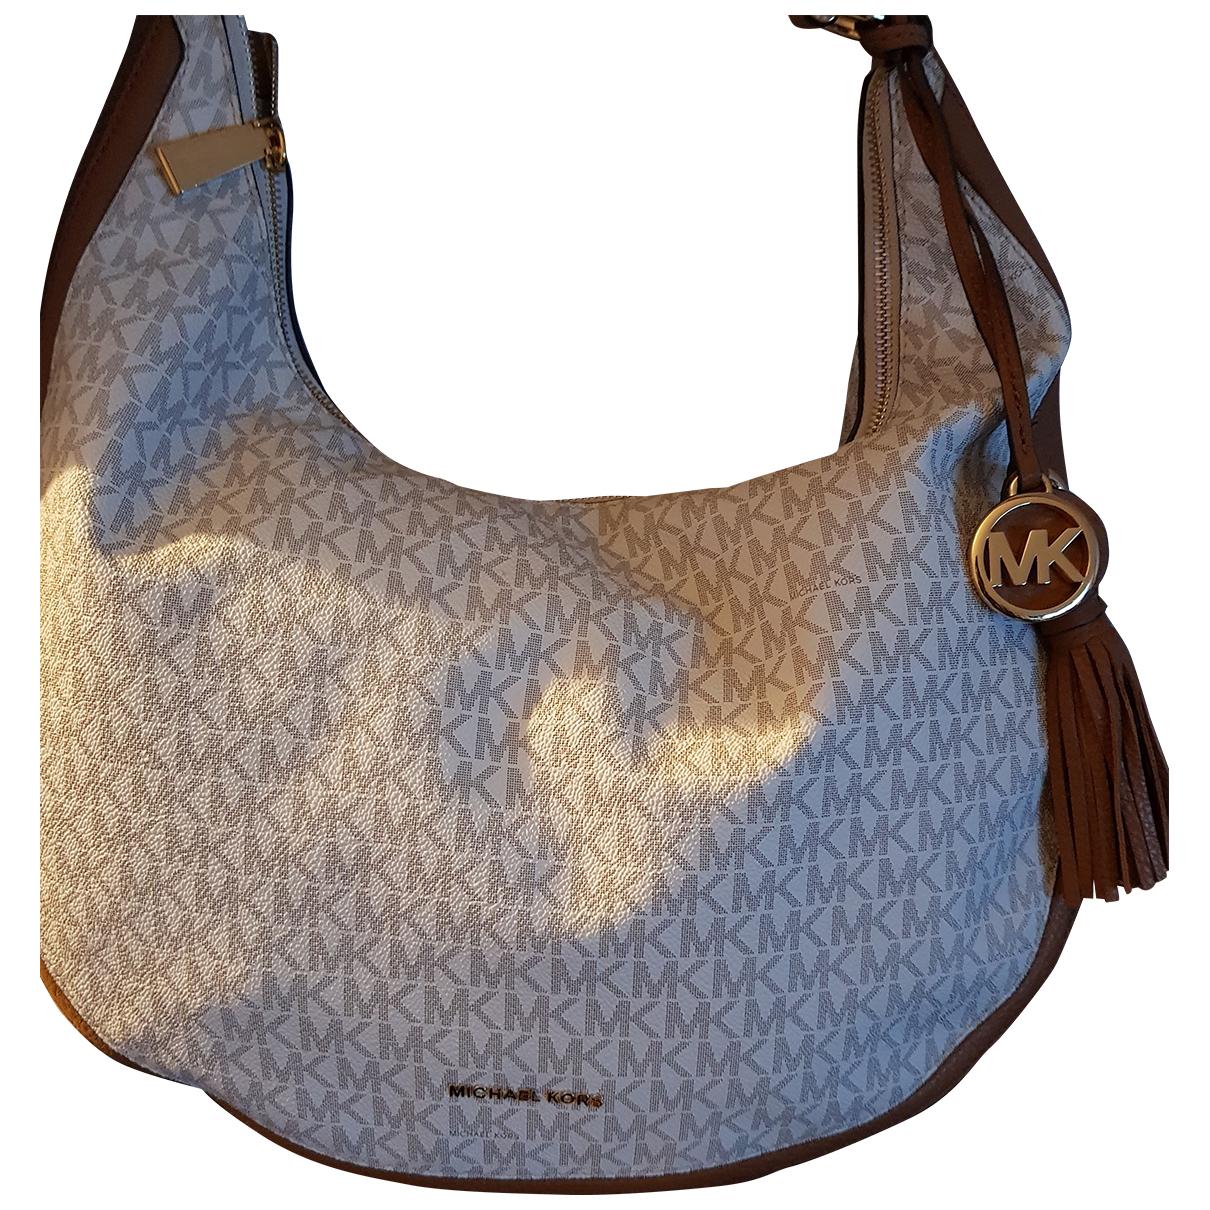 Michael Kors N Ecru handbag for Women N